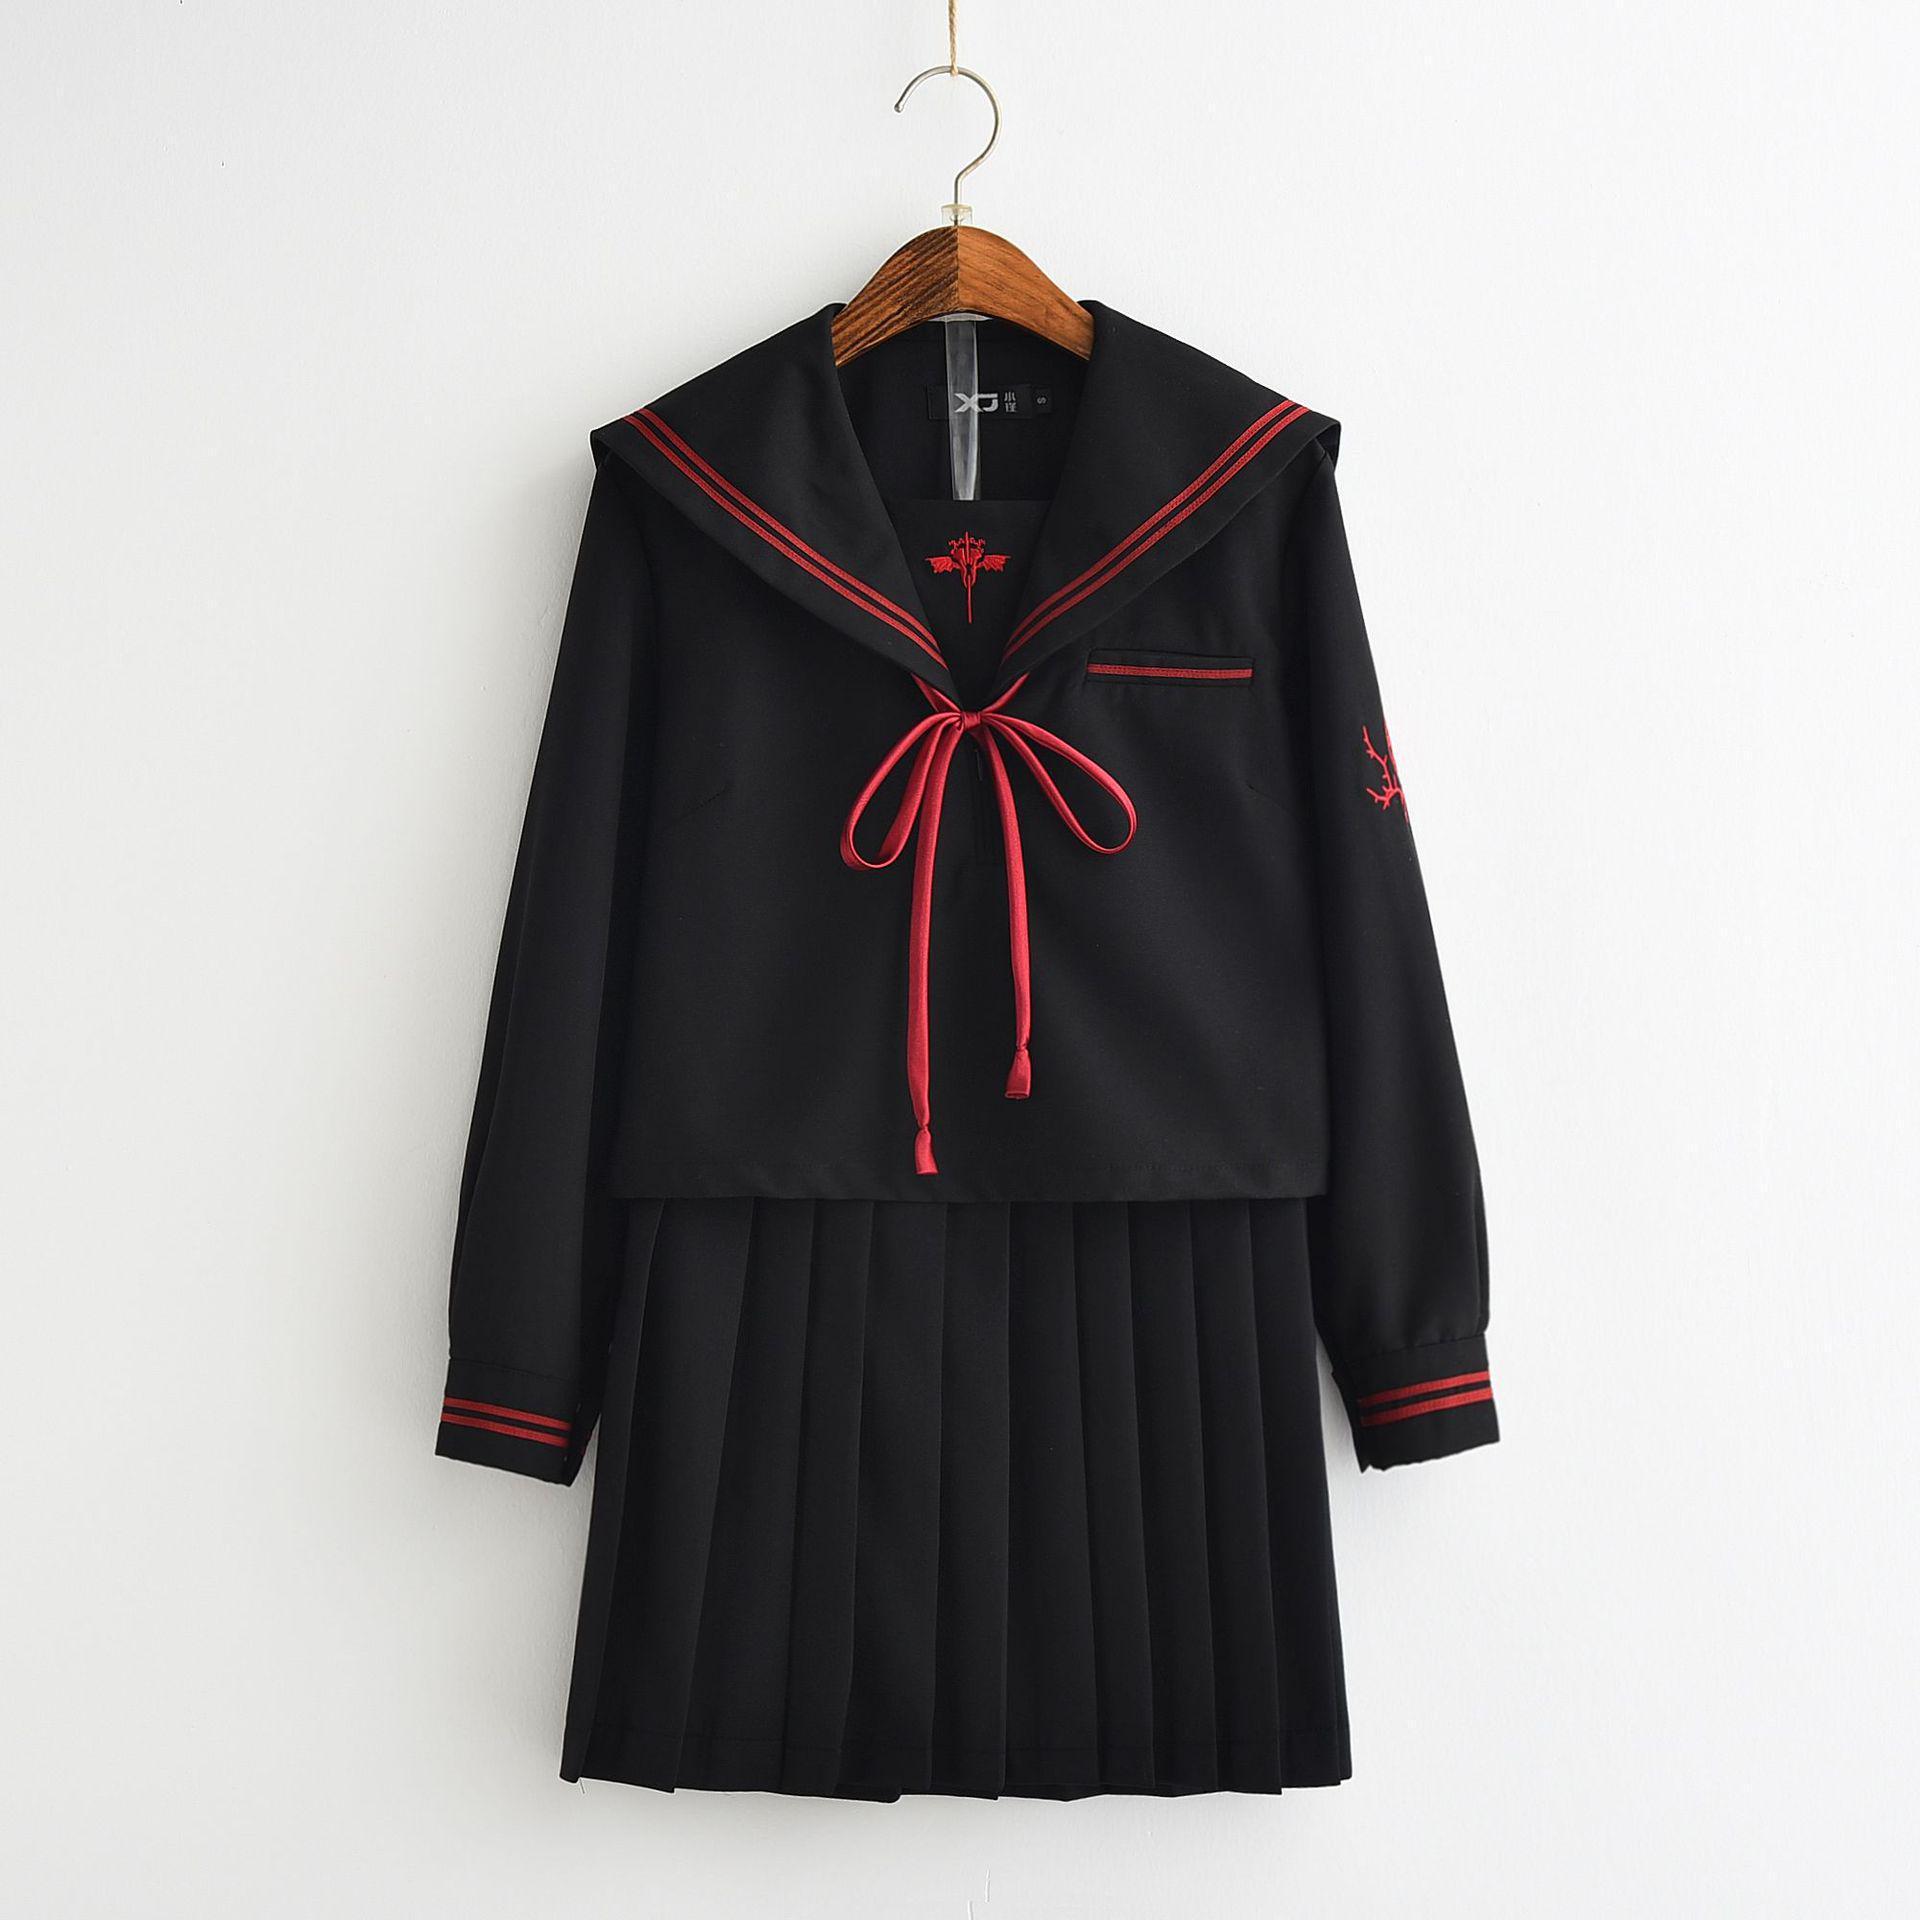 New School Uniforms Japanese Dark Devil Bad Junior Design Long Sleeve Autumn Winter Collage Student Sailors